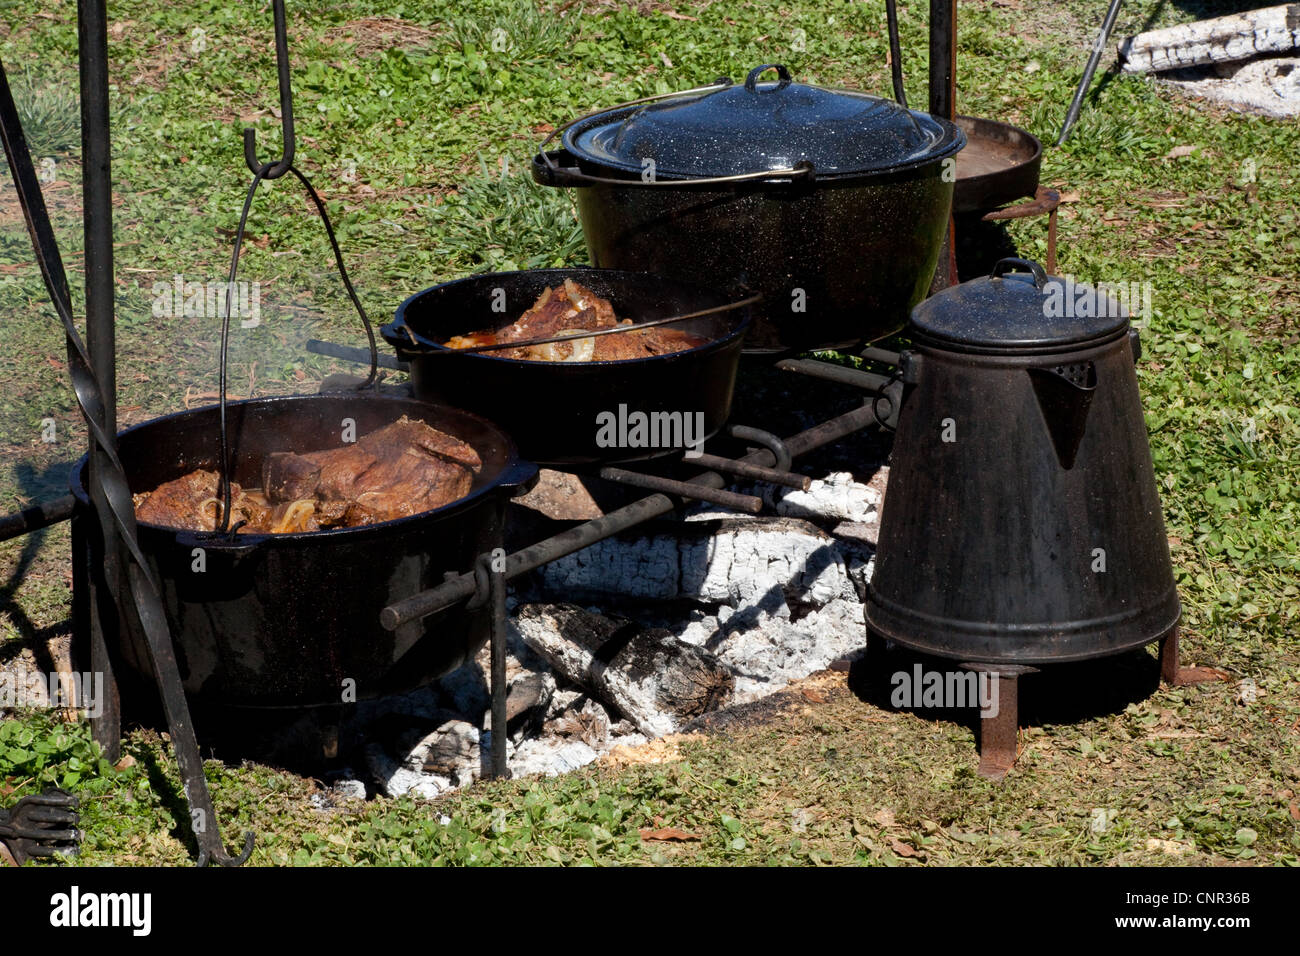 cast iron cooking pots over stock photos cast iron cooking pots over stock images alamy. Black Bedroom Furniture Sets. Home Design Ideas